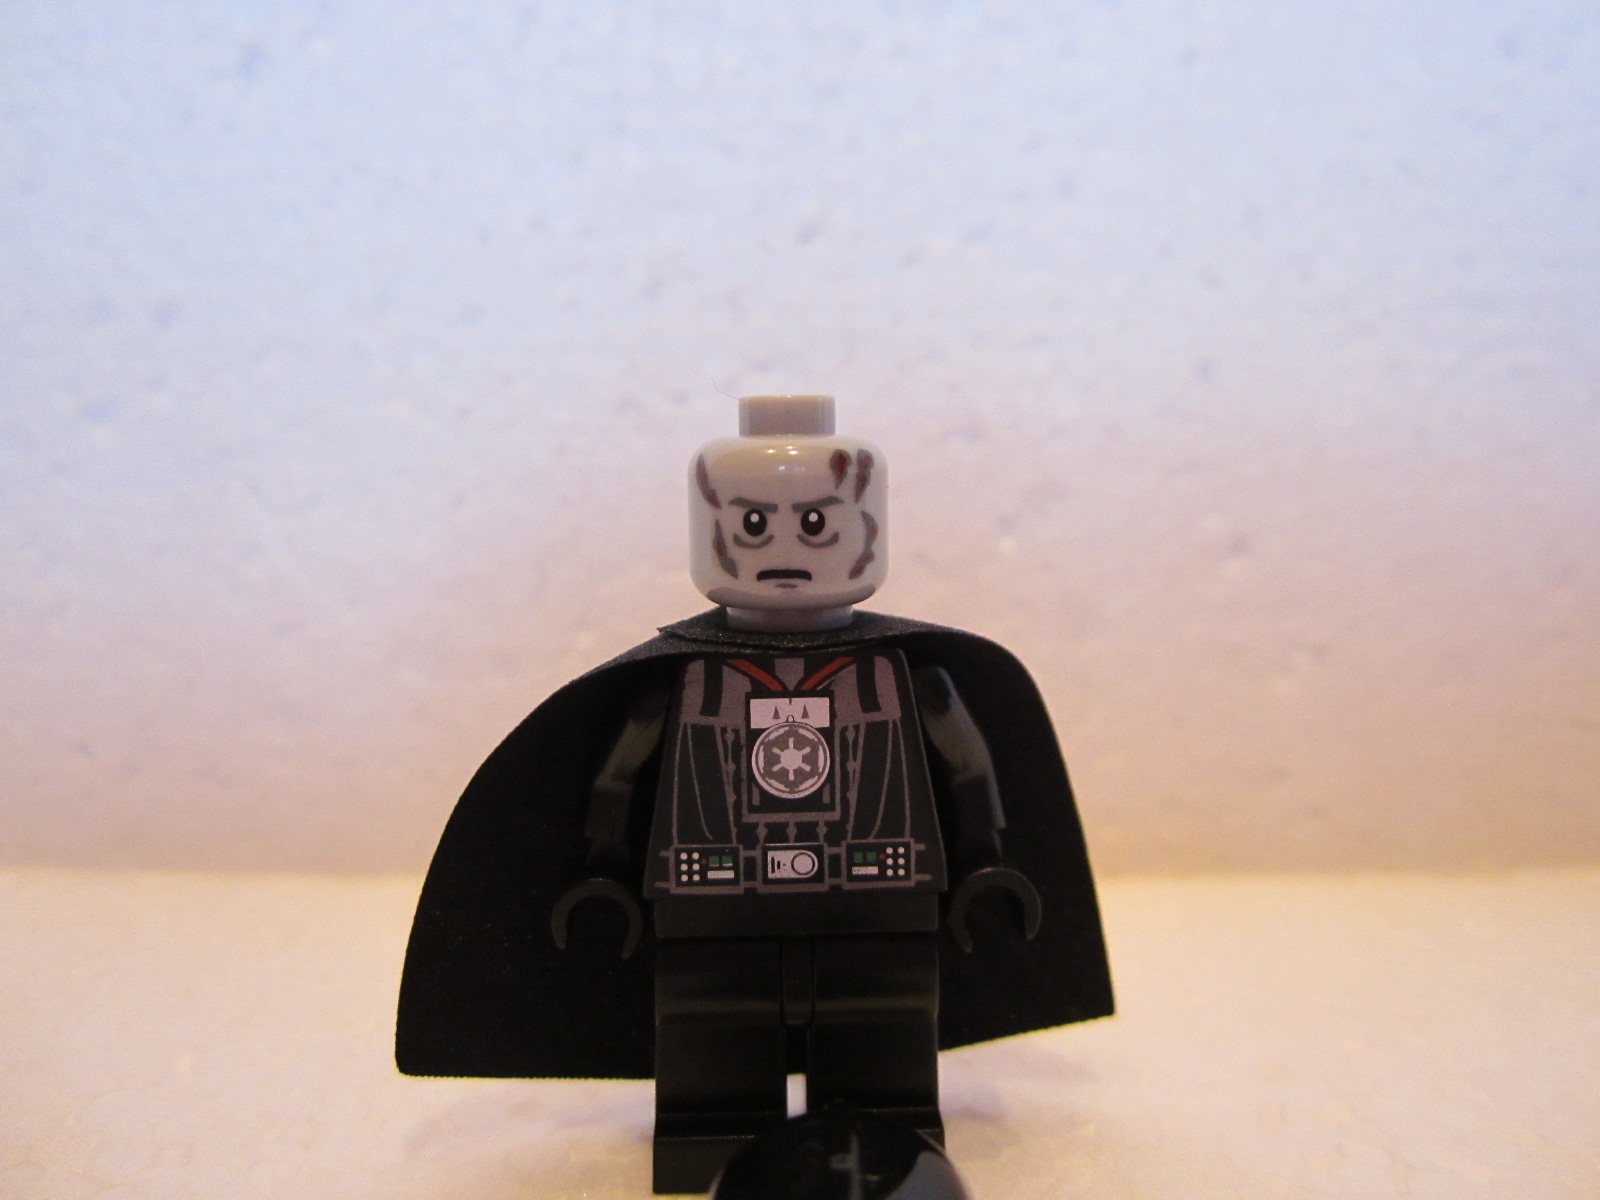 dvd l 39 empire en vrac lego star wars lego r by alkinoos. Black Bedroom Furniture Sets. Home Design Ideas